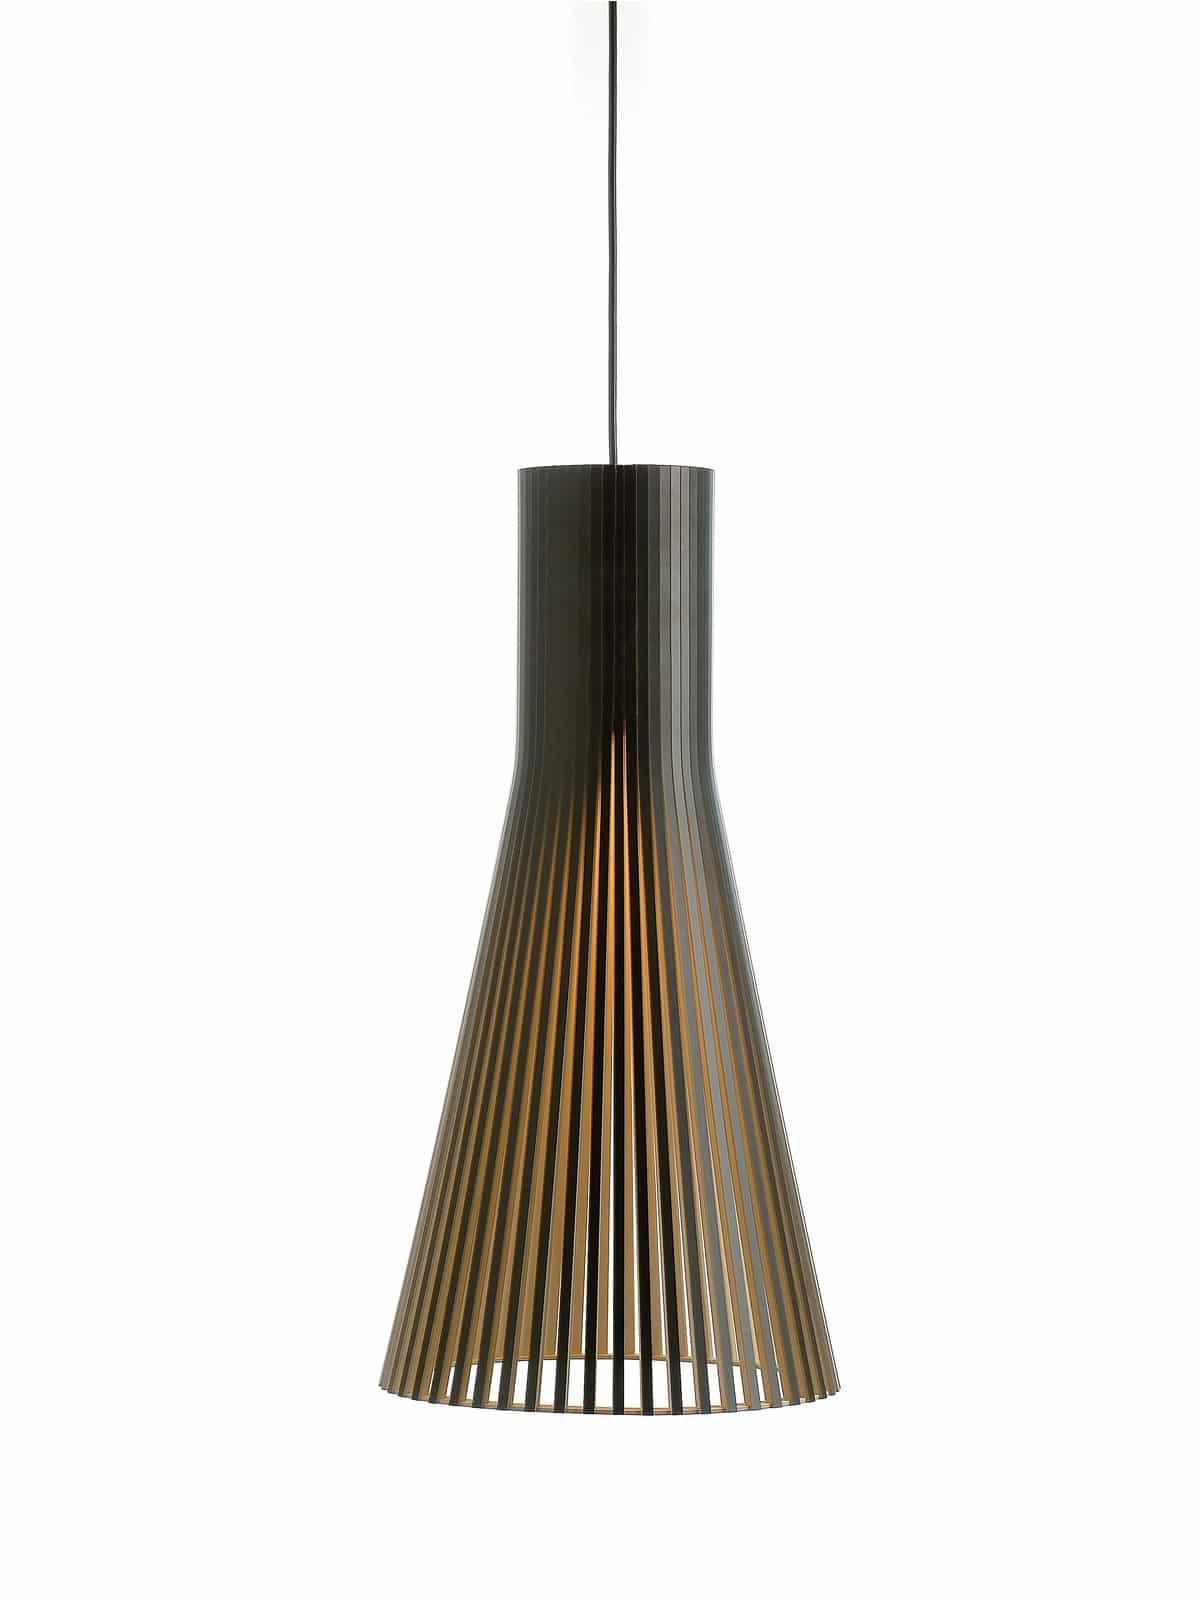 Secto 4200 Leuchte DesignOrt